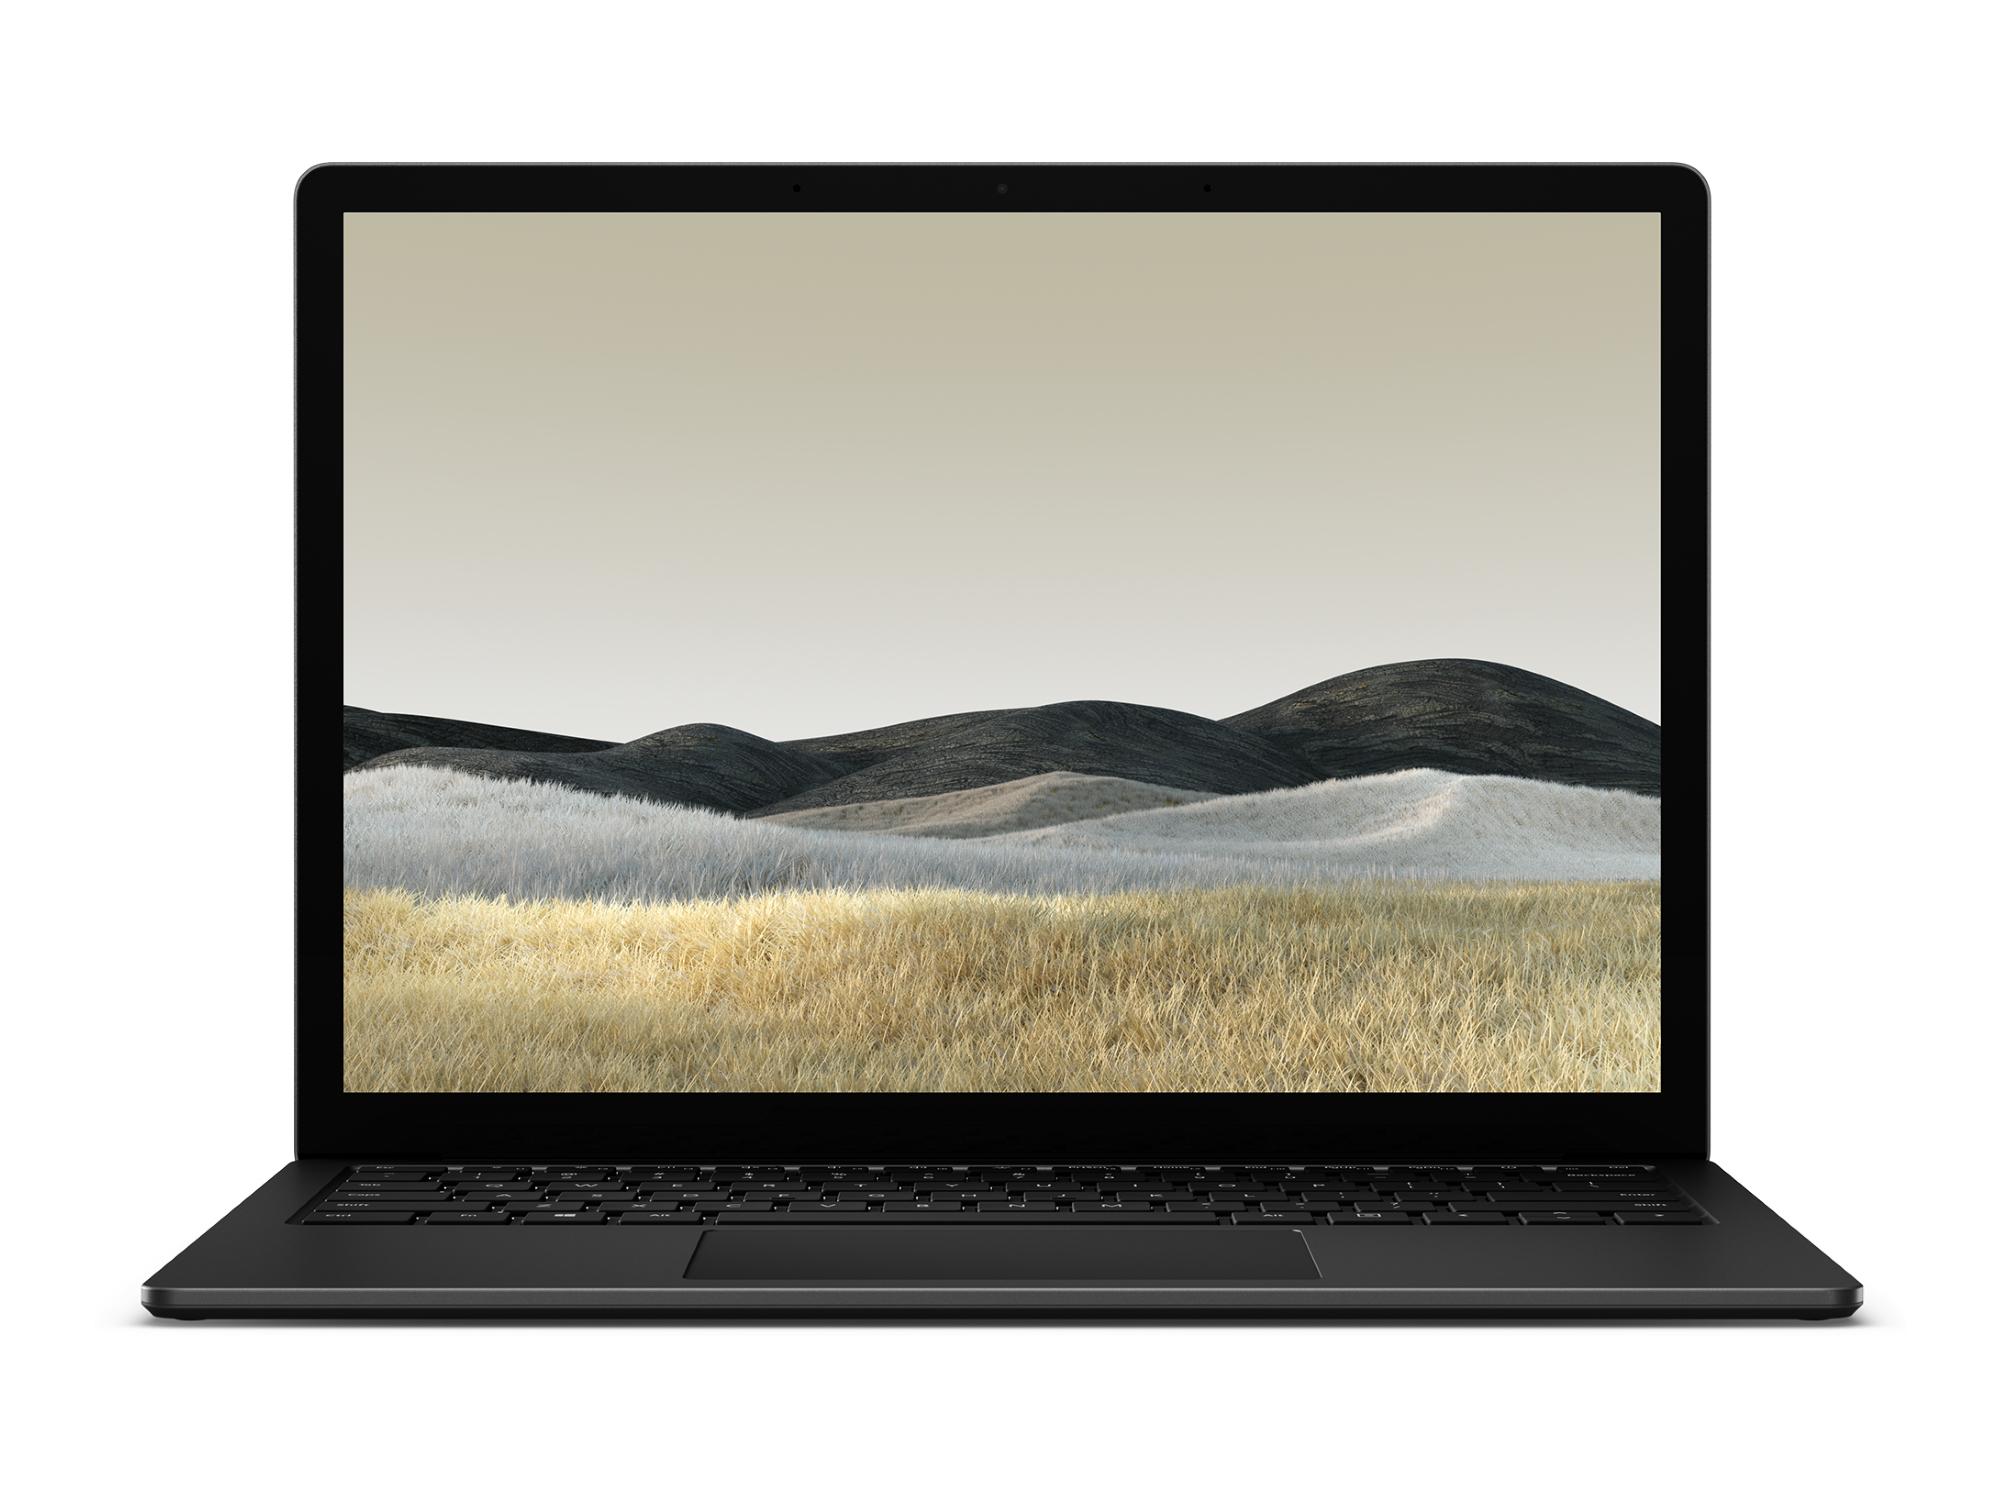 "Microsoft Surface Laptop 3 LPDDR4x-SDRAM Notebook 34.3 cm (13.5"") 2256 x 1504 pixels Touchscreen 10th gen Intel-� Core��� i5 8 GB 256 GB SSD Wi-Fi 6 (802.11ax) Windows 10 Home Black"